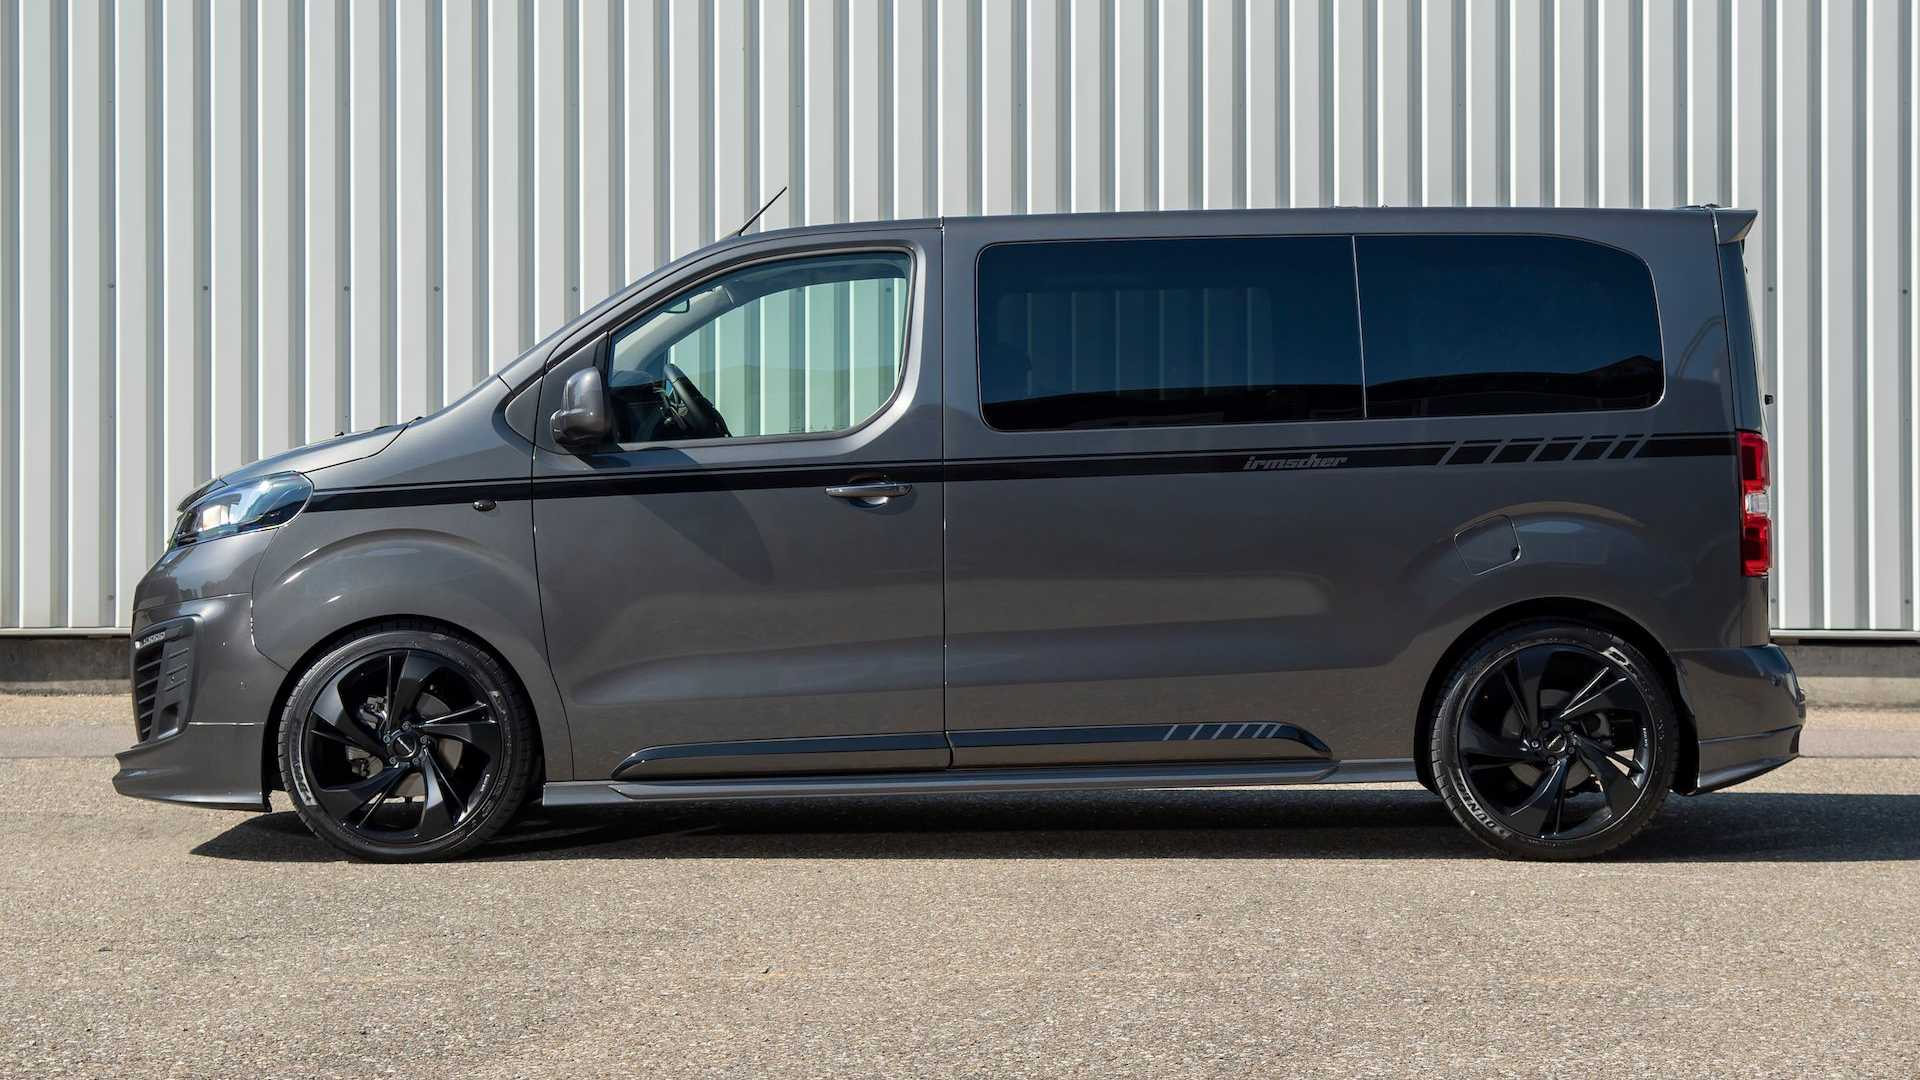 2016 - [Citroën/Peugeot/Toyota] SpaceTourer/Traveller/ProAce - Page 40 Irmscher-is3-black-phantom-based-on-opel-zafira